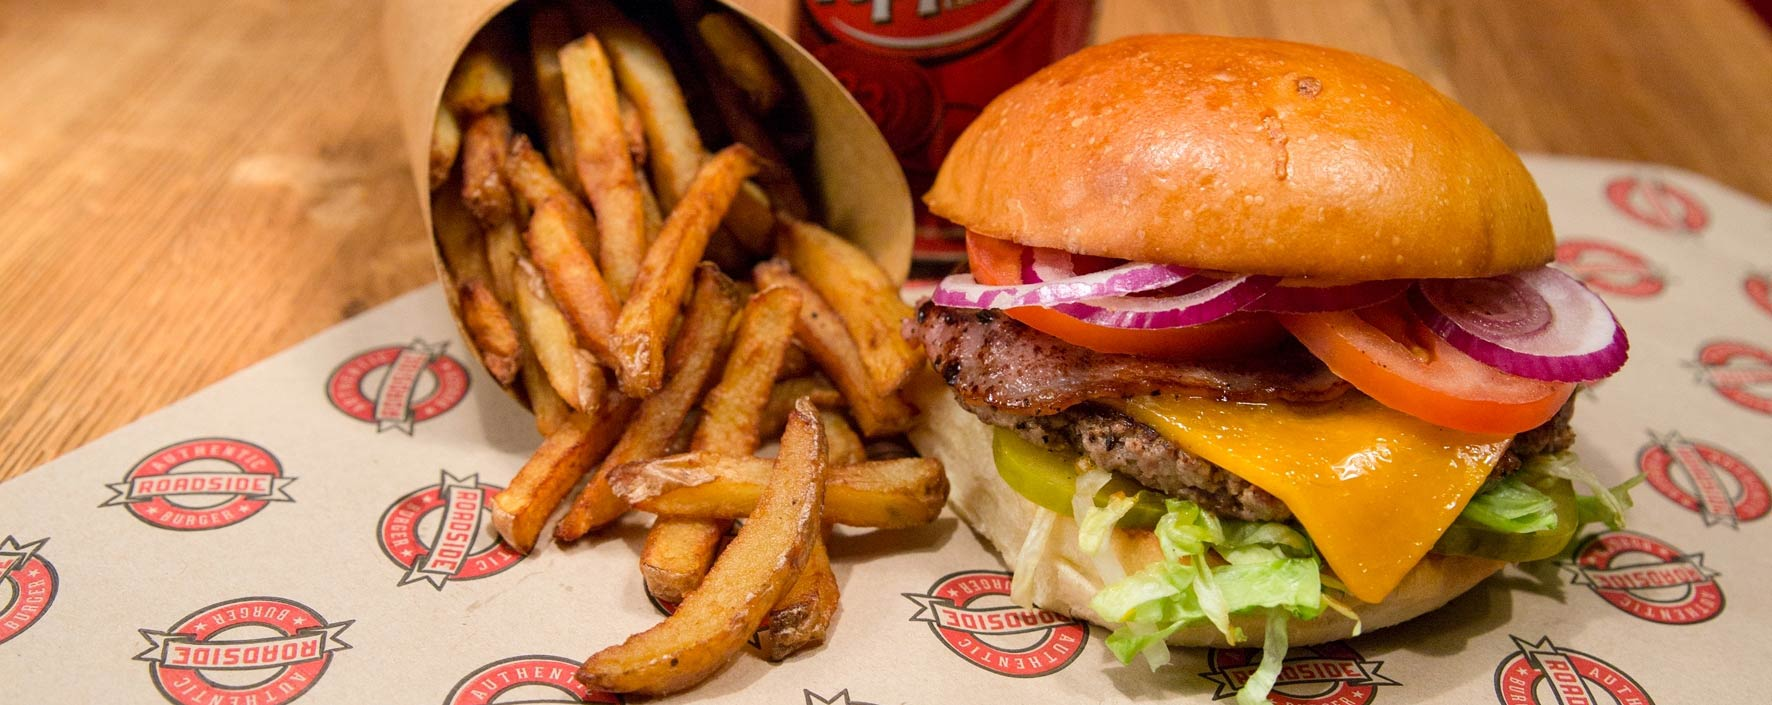 Burger-menu-complet-roadside